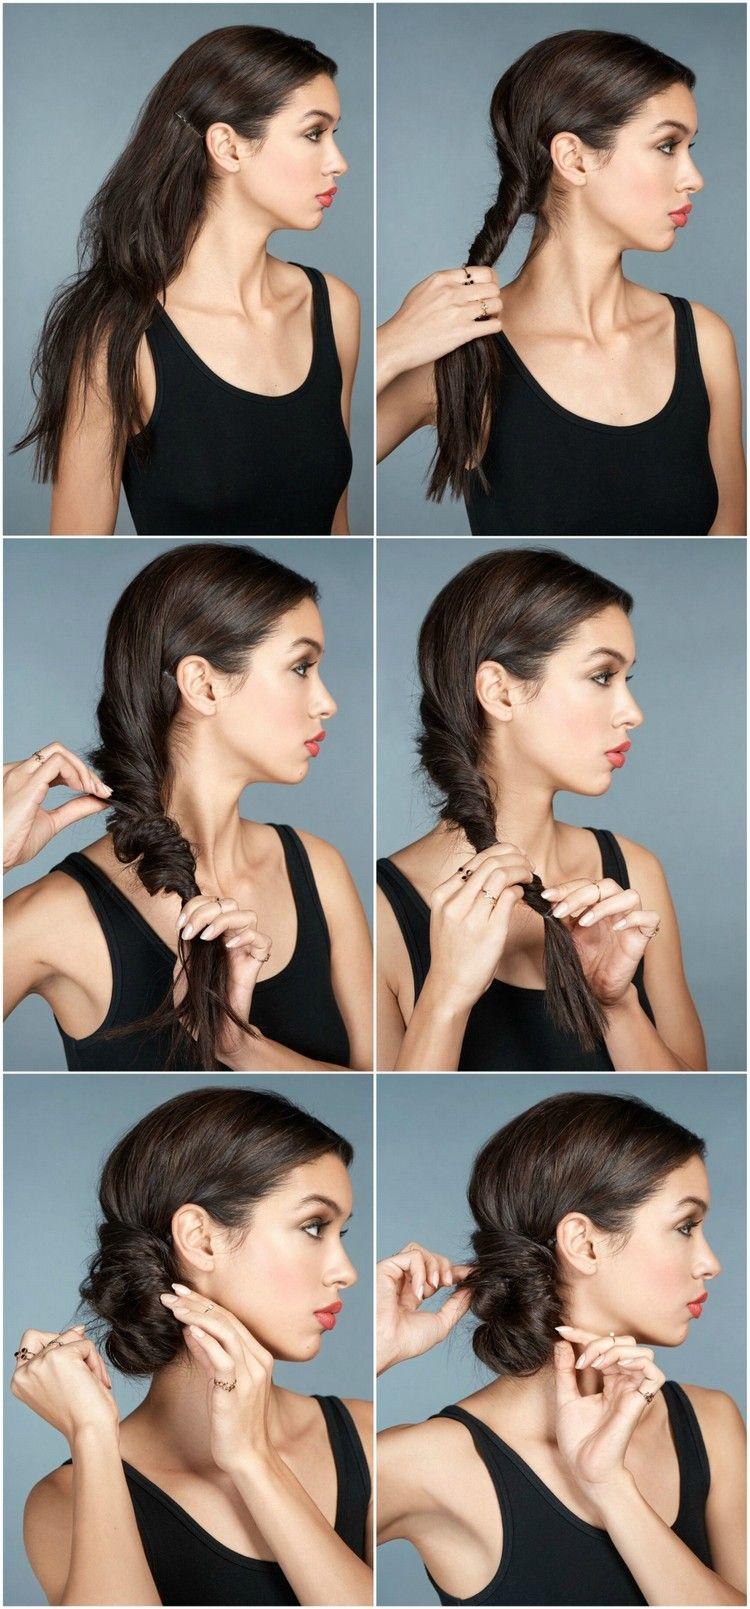 Festliche Hochsteckfrisuren Mit Anleitung 6 Styling Ideen Perfekt Zu Silvester Frisur Hochgesteckt Frisuren